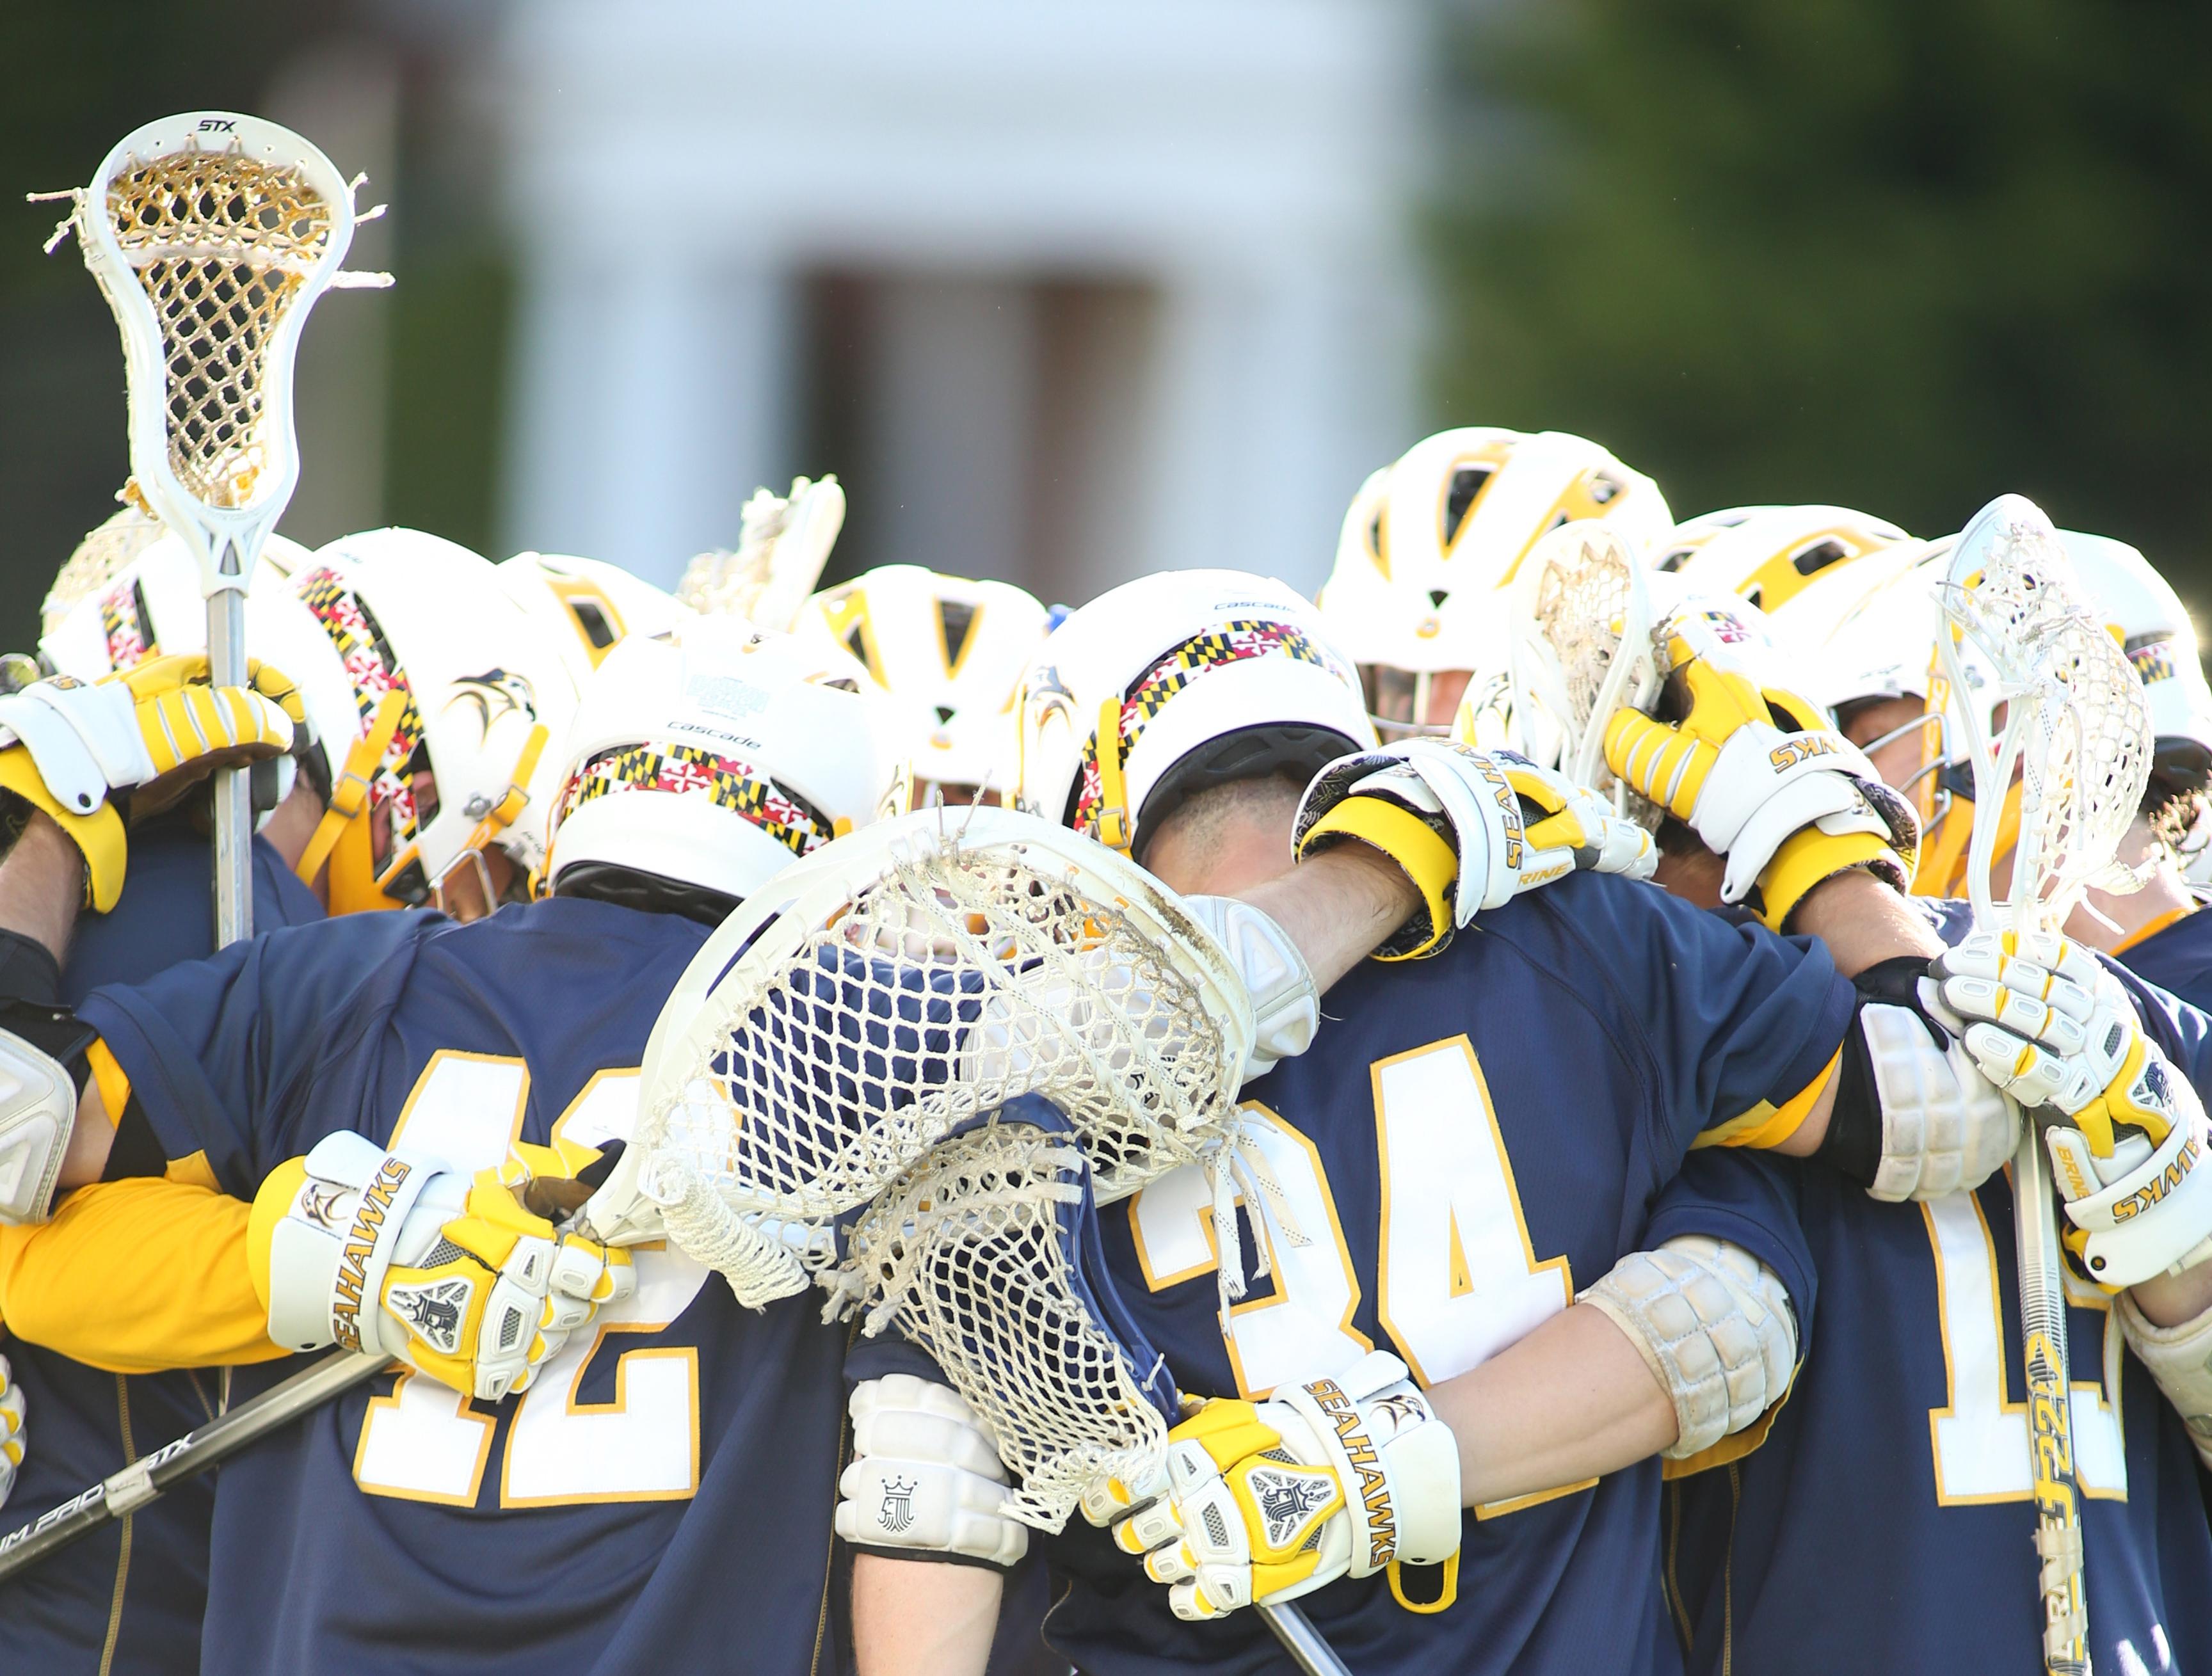 Men's Lacrosse team in a huddle